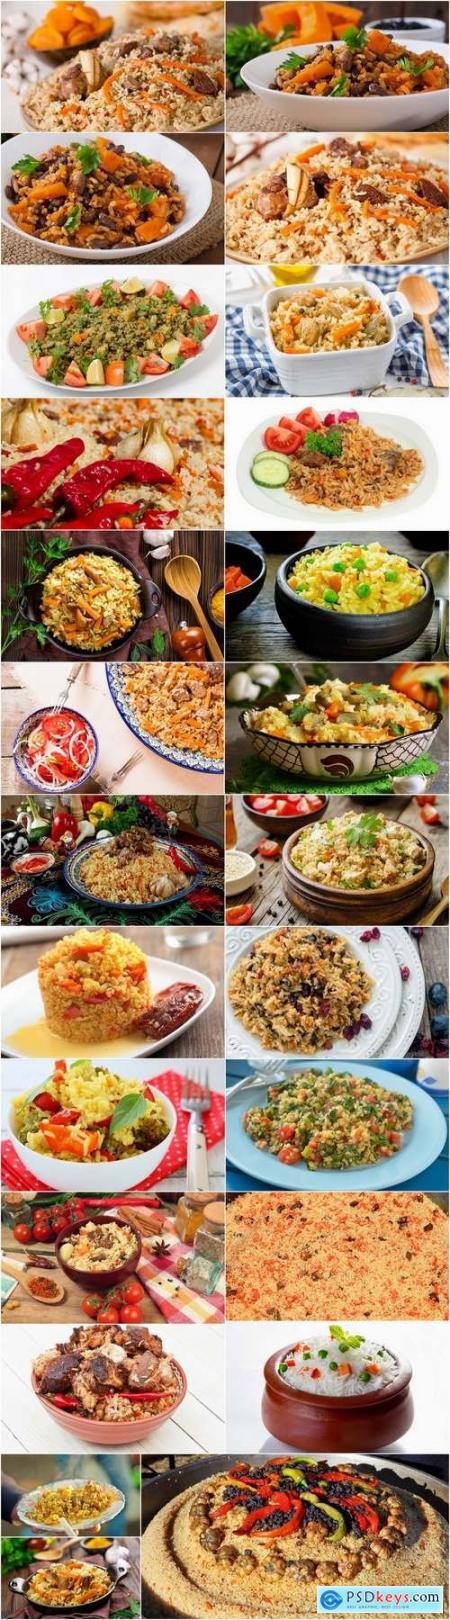 Pilaf rice dish 25 HQ Jpeg